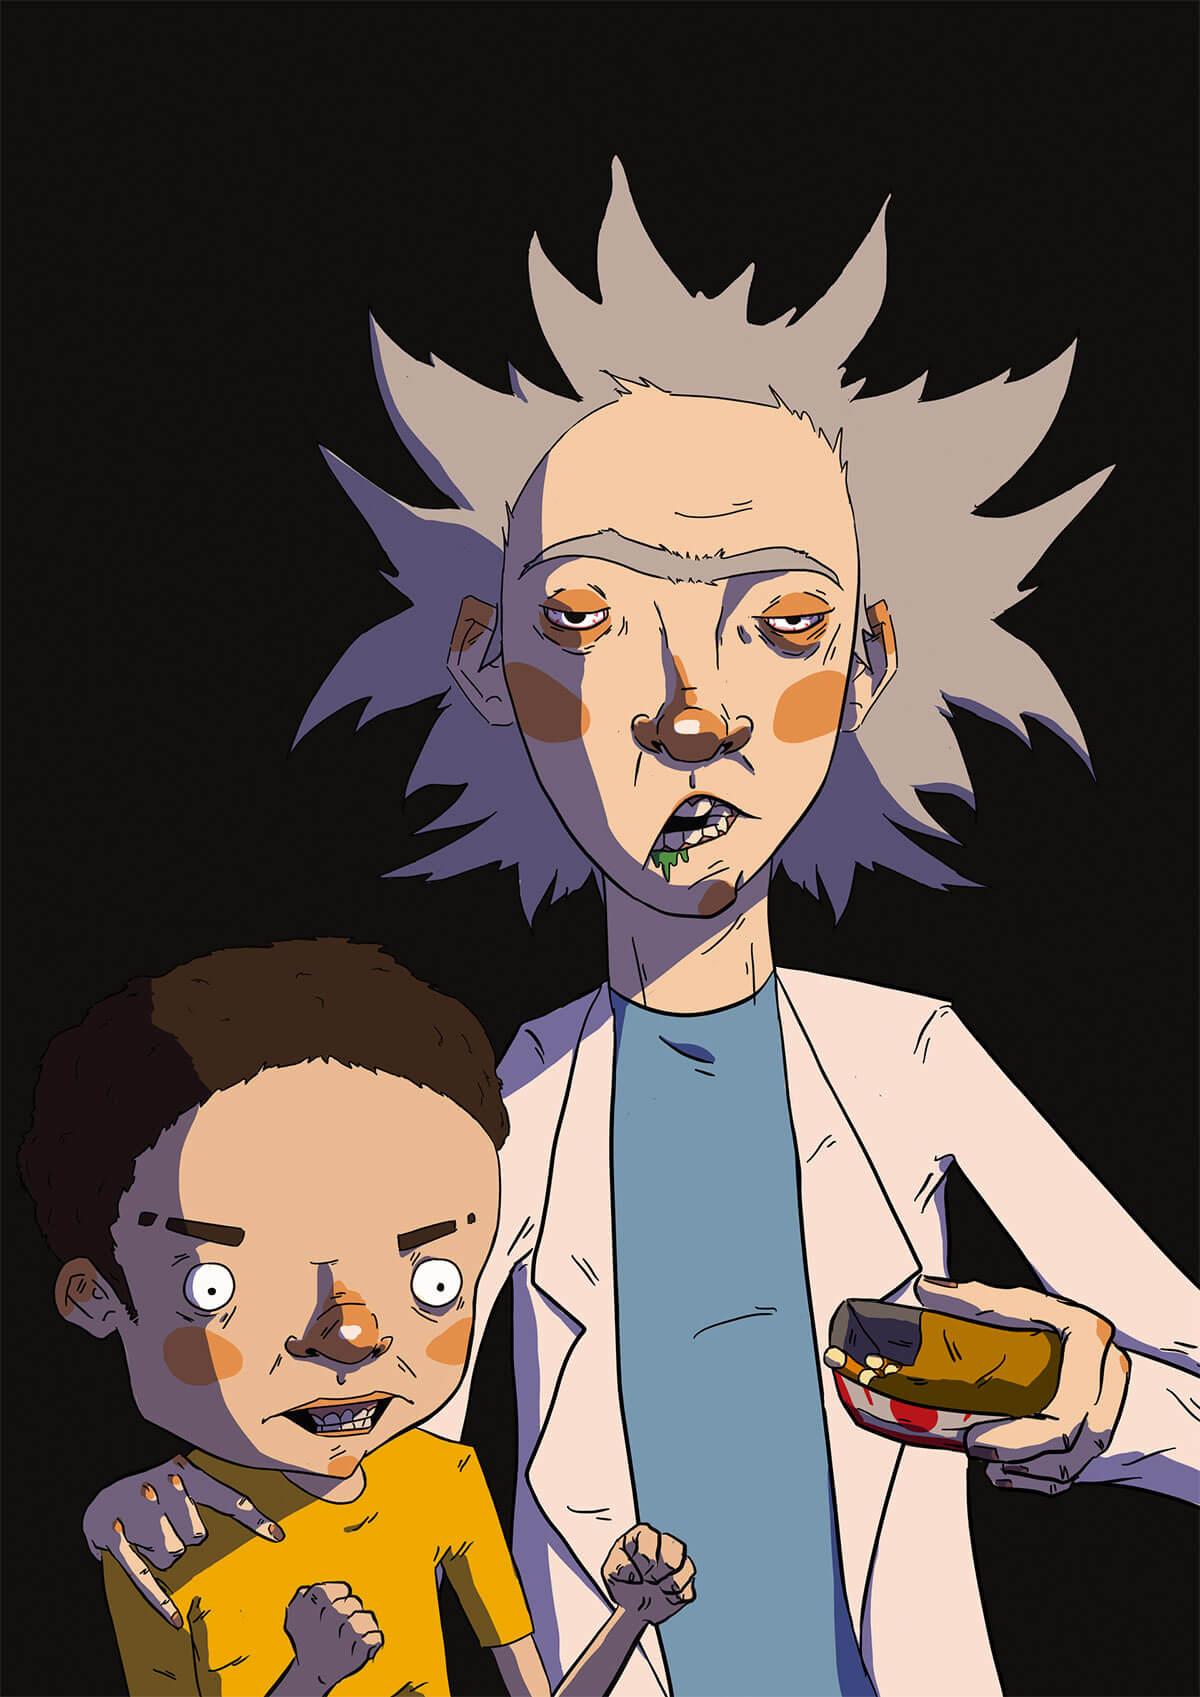 Rick and Morty by Tijuana Malibu